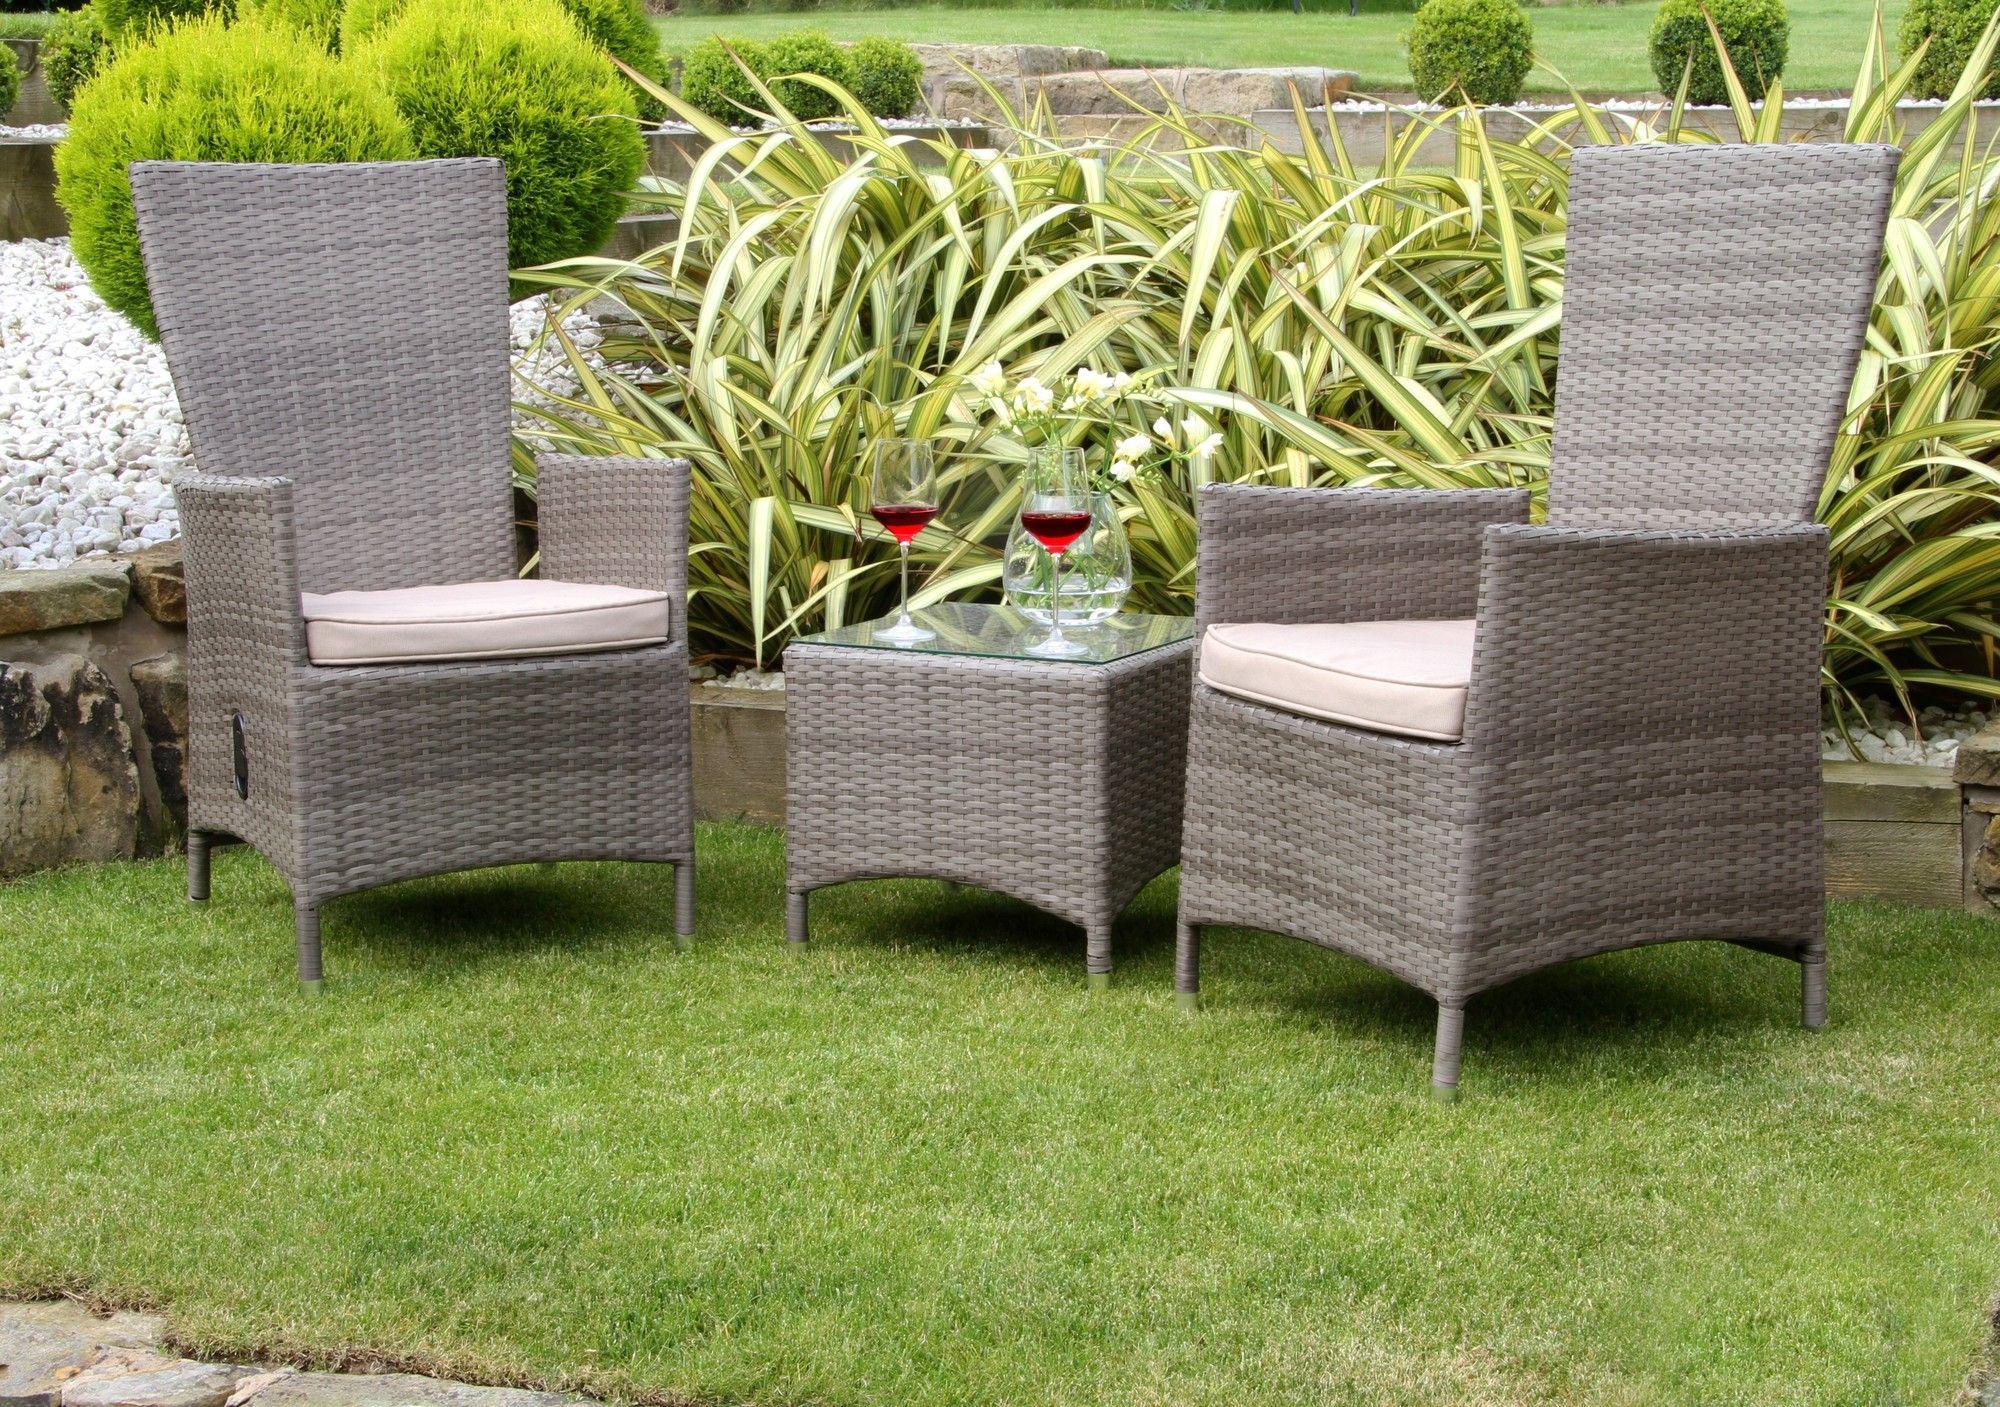 Auckland 9 Seater Bistro Set with Cushions  Wayfair UK  Garden